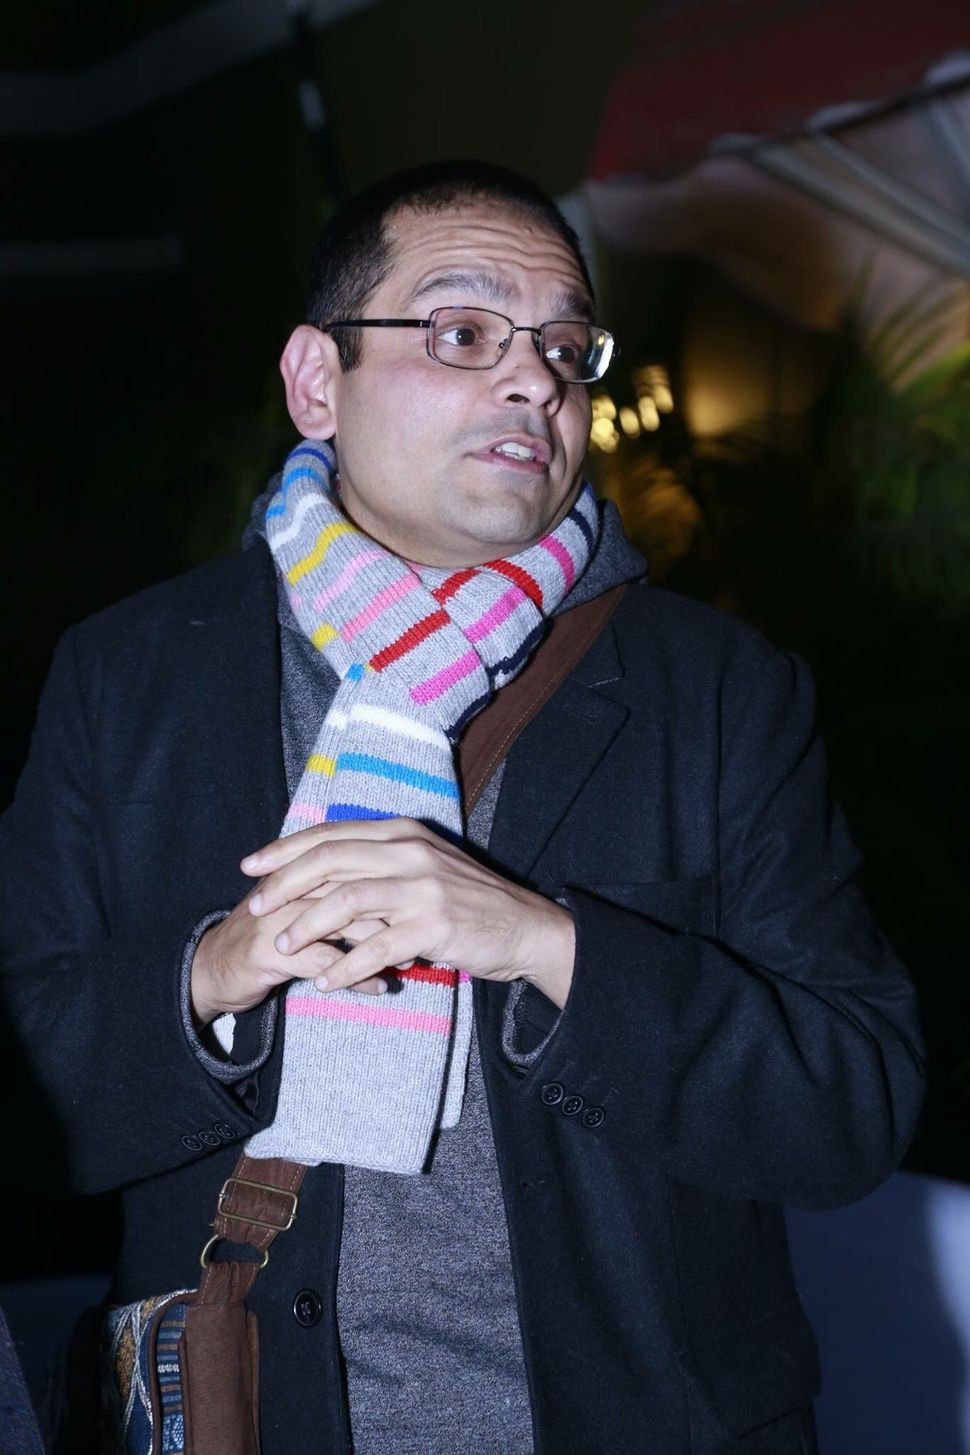 Sharif D. Rangnekar